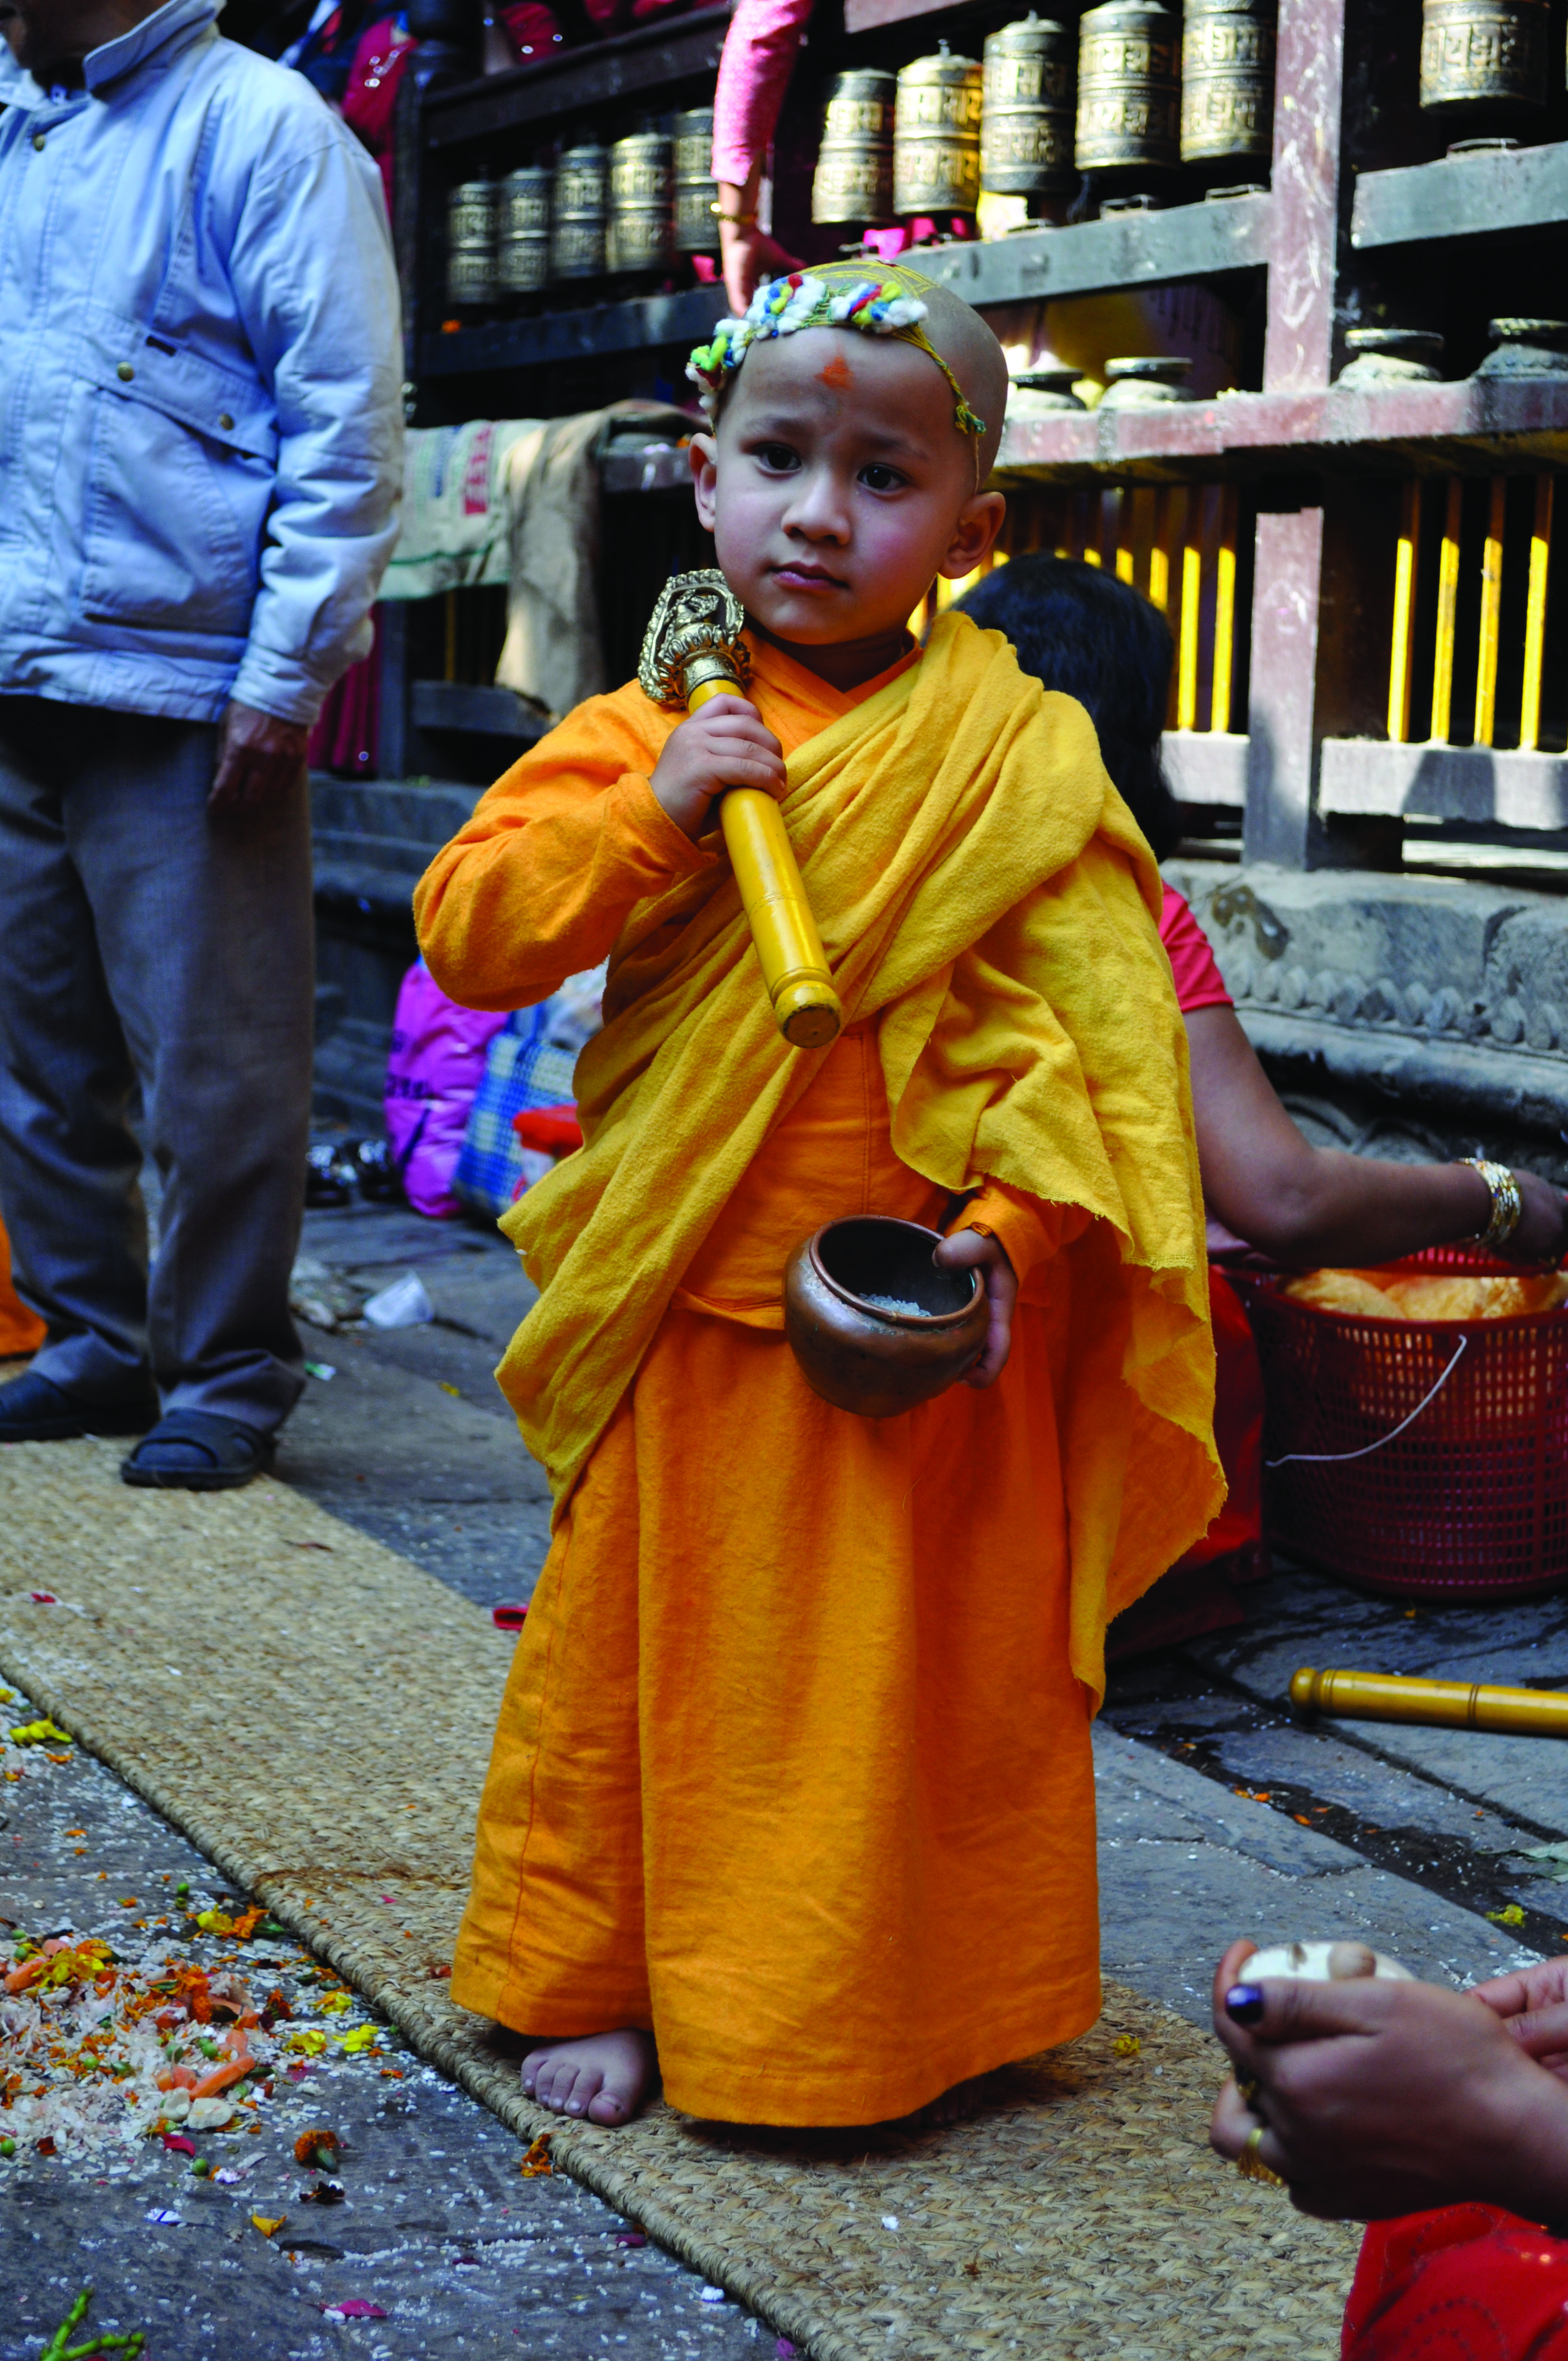 Adorning the Buddhas: The Ceremonial Regalia of the Daśa